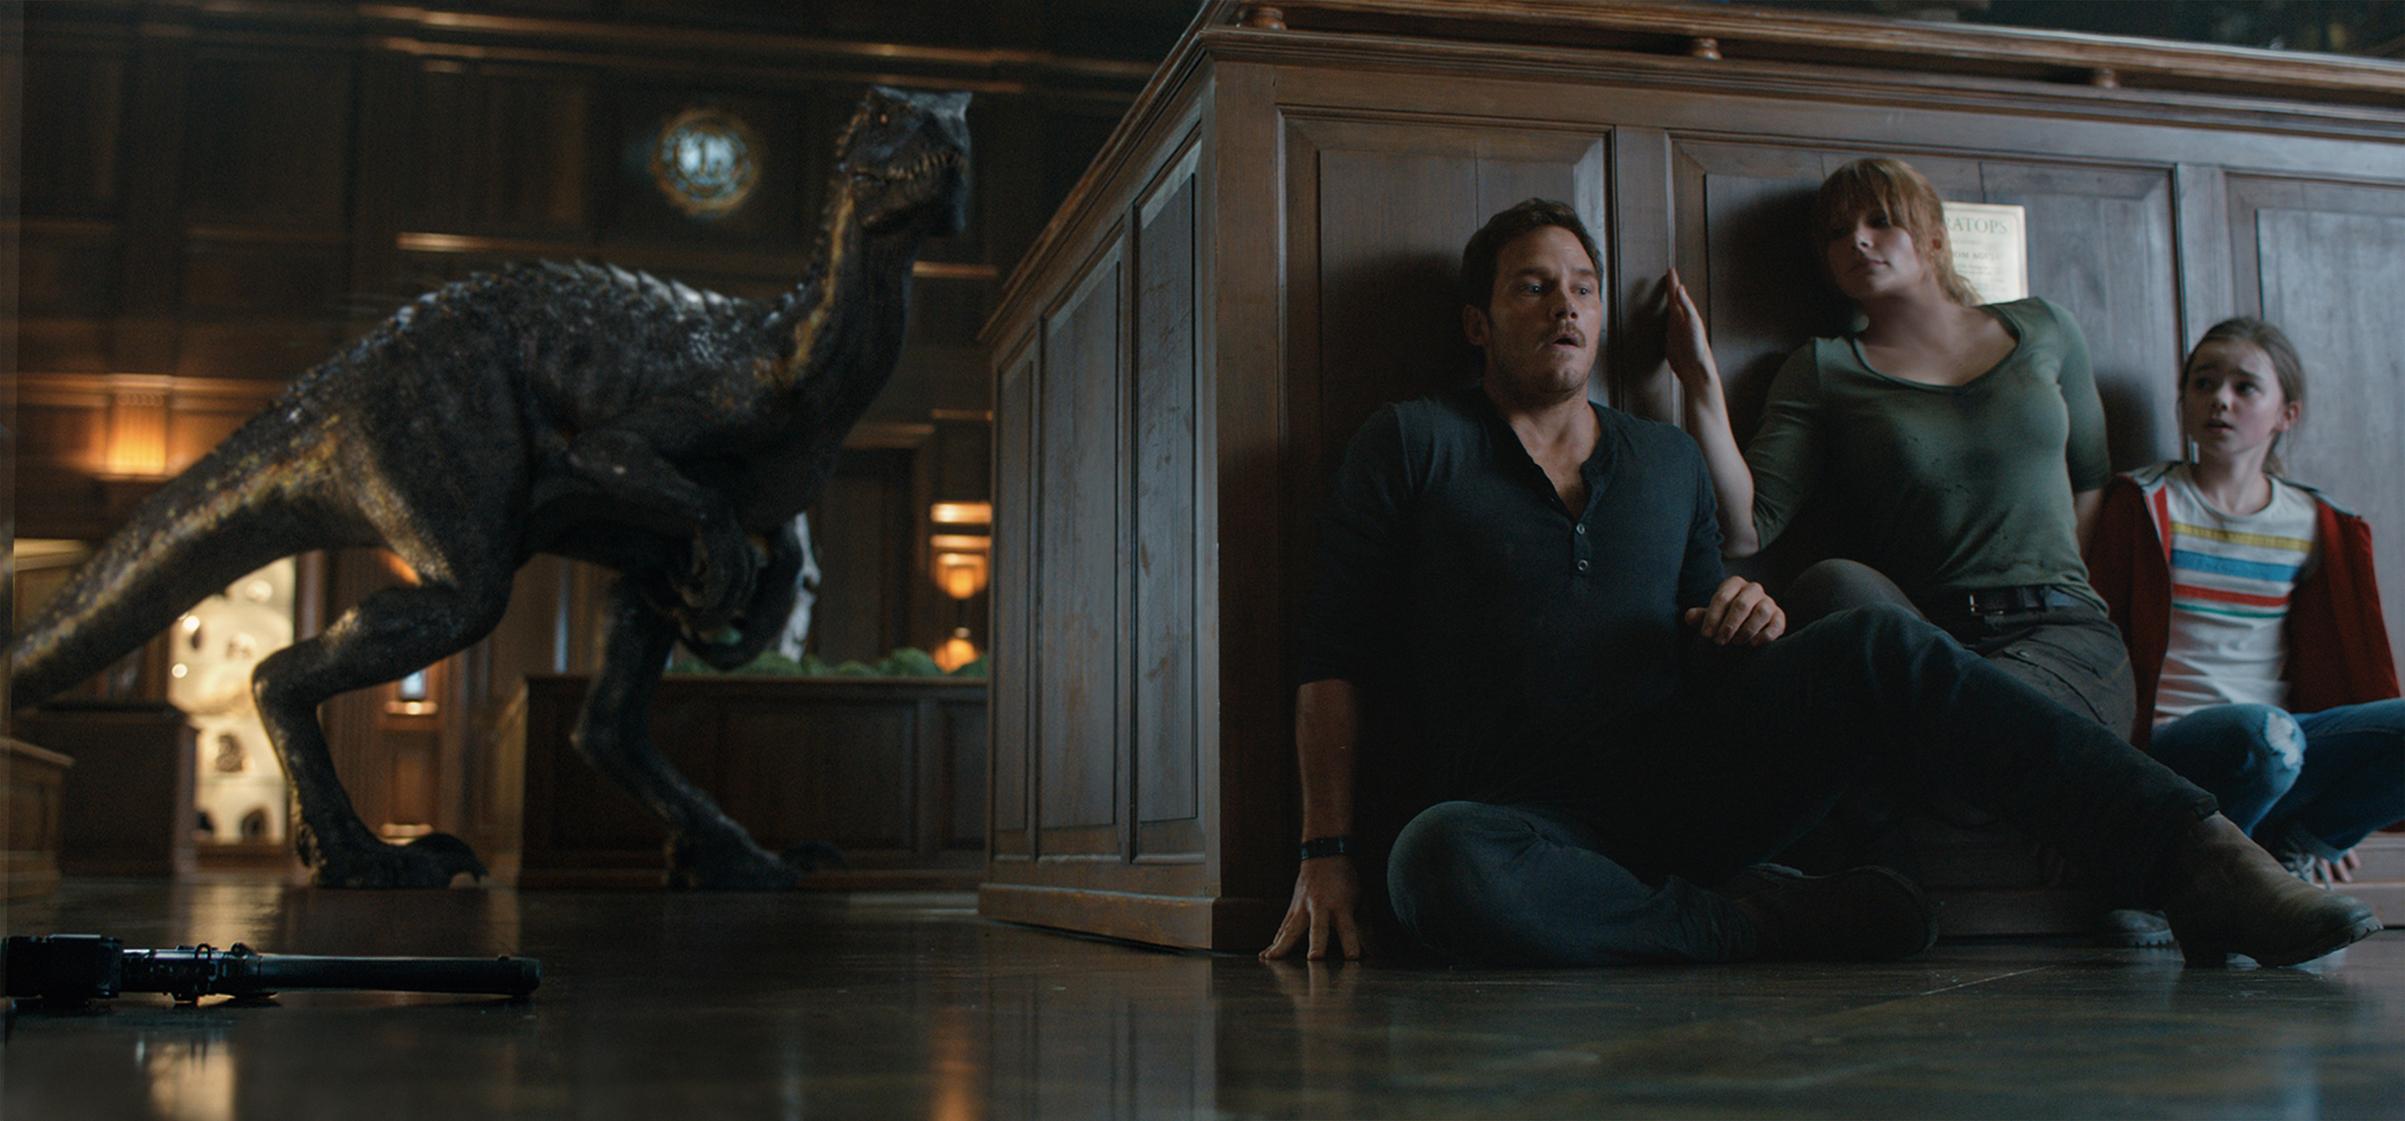 Chris Pratt, Bryce Dallas Howard and Isabella Sermon: when dinosaurs roamed the hallways